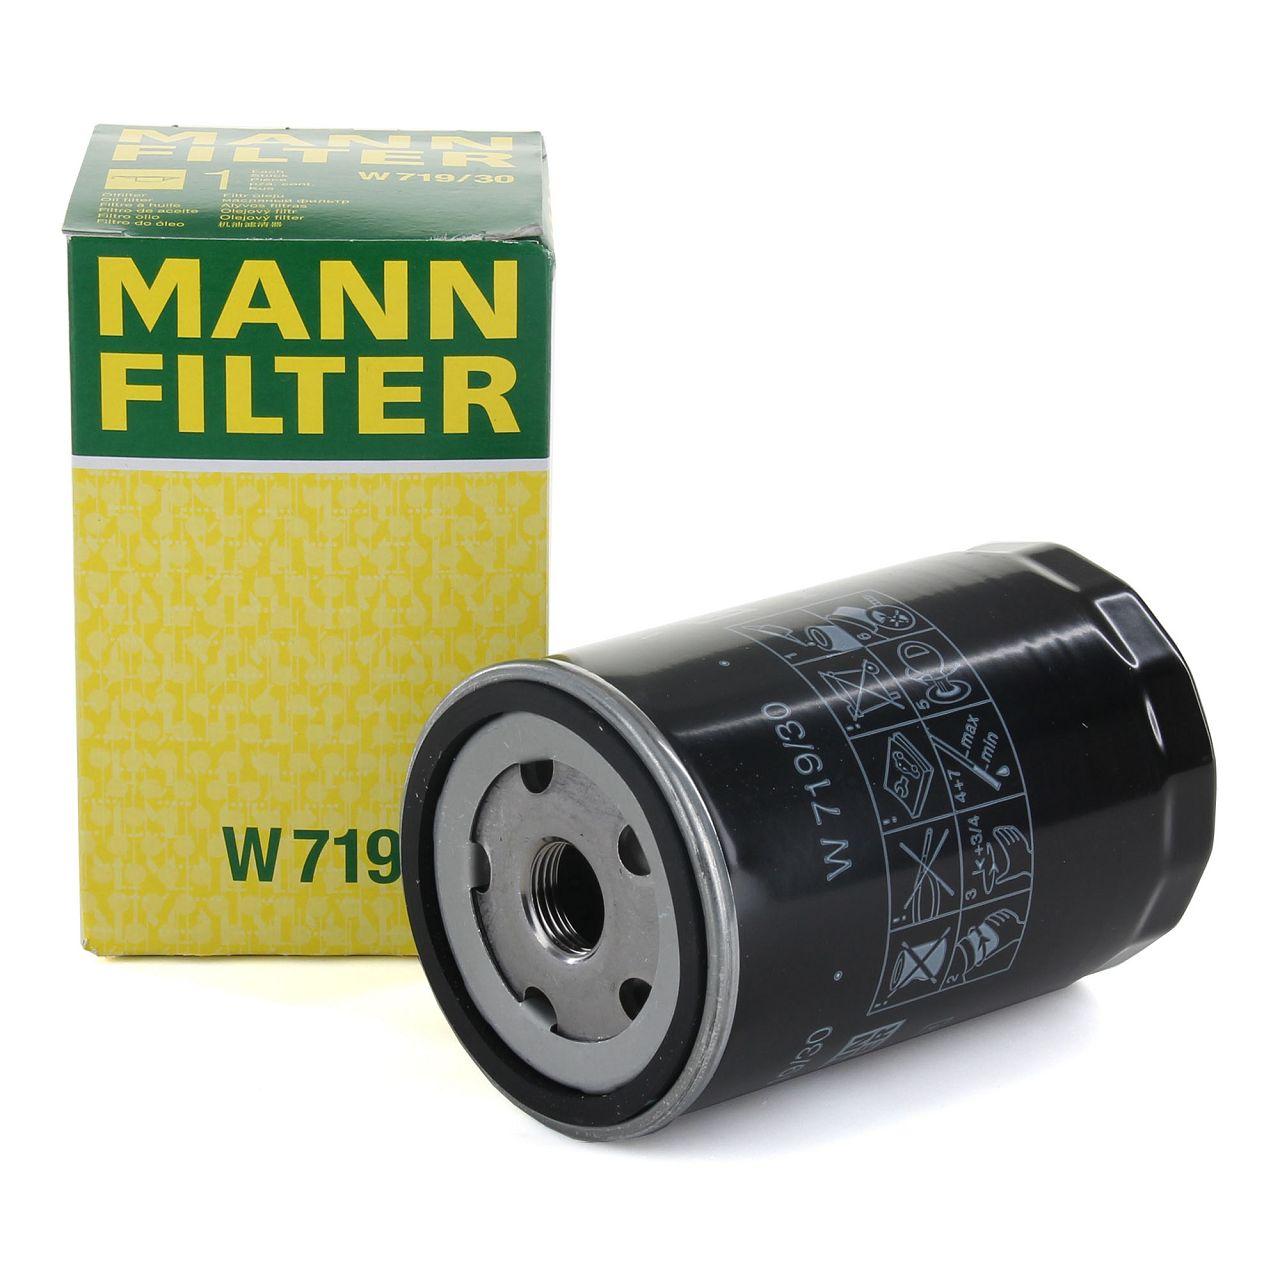 MANN W719/30 Ölfilter AUDI A3 A4 A6 A8 SEAT SKODA VW Golf 3 4 5 6 Passat T4 T5